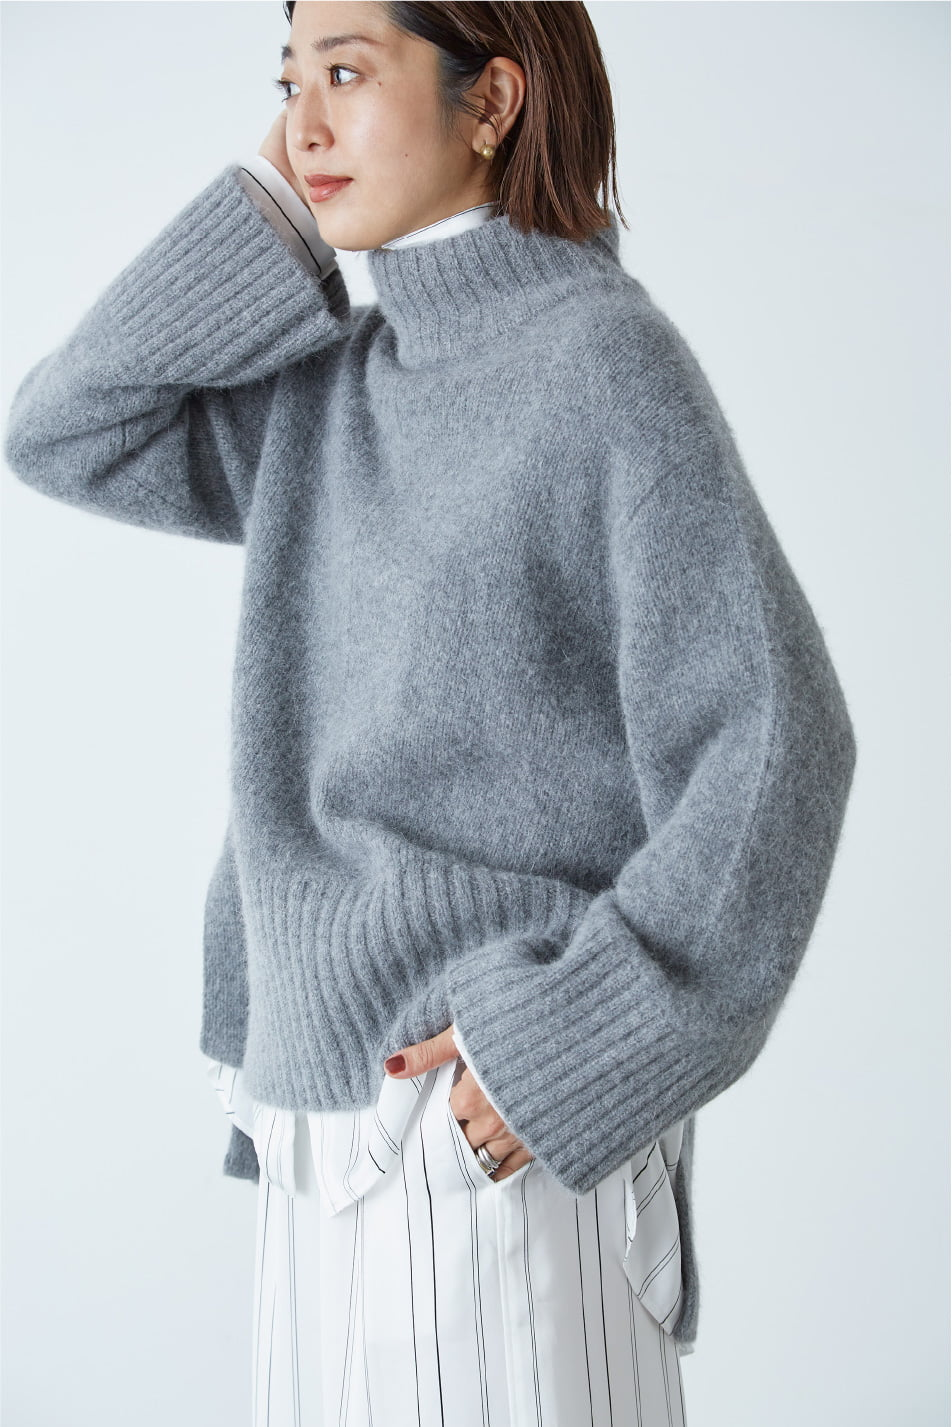 Wool Angora High Neck Knit: Casual Style